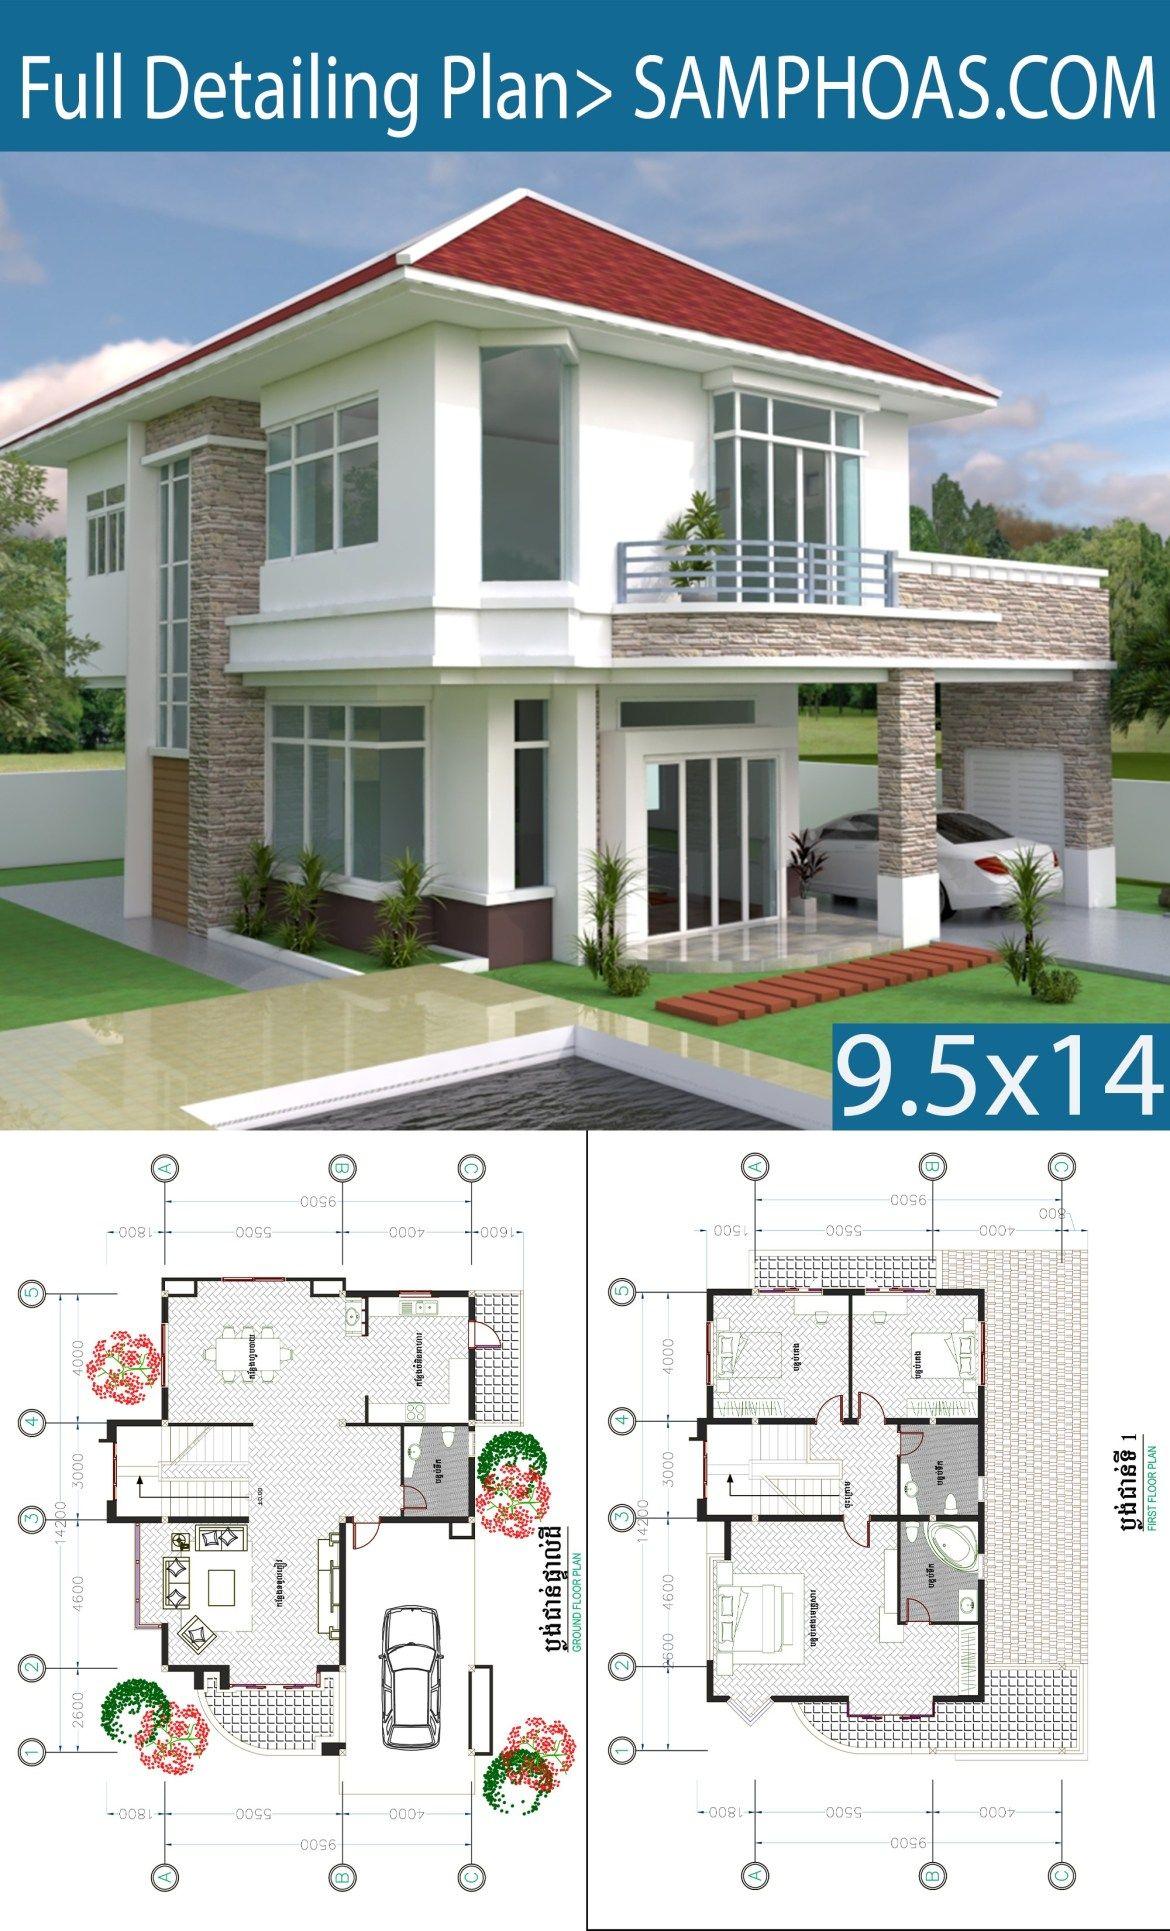 3 Bedrooms Modern Home Plan 9 5 X14 2m Samphoas Plansearch Modern House Plans House Plans Beautiful House Plans